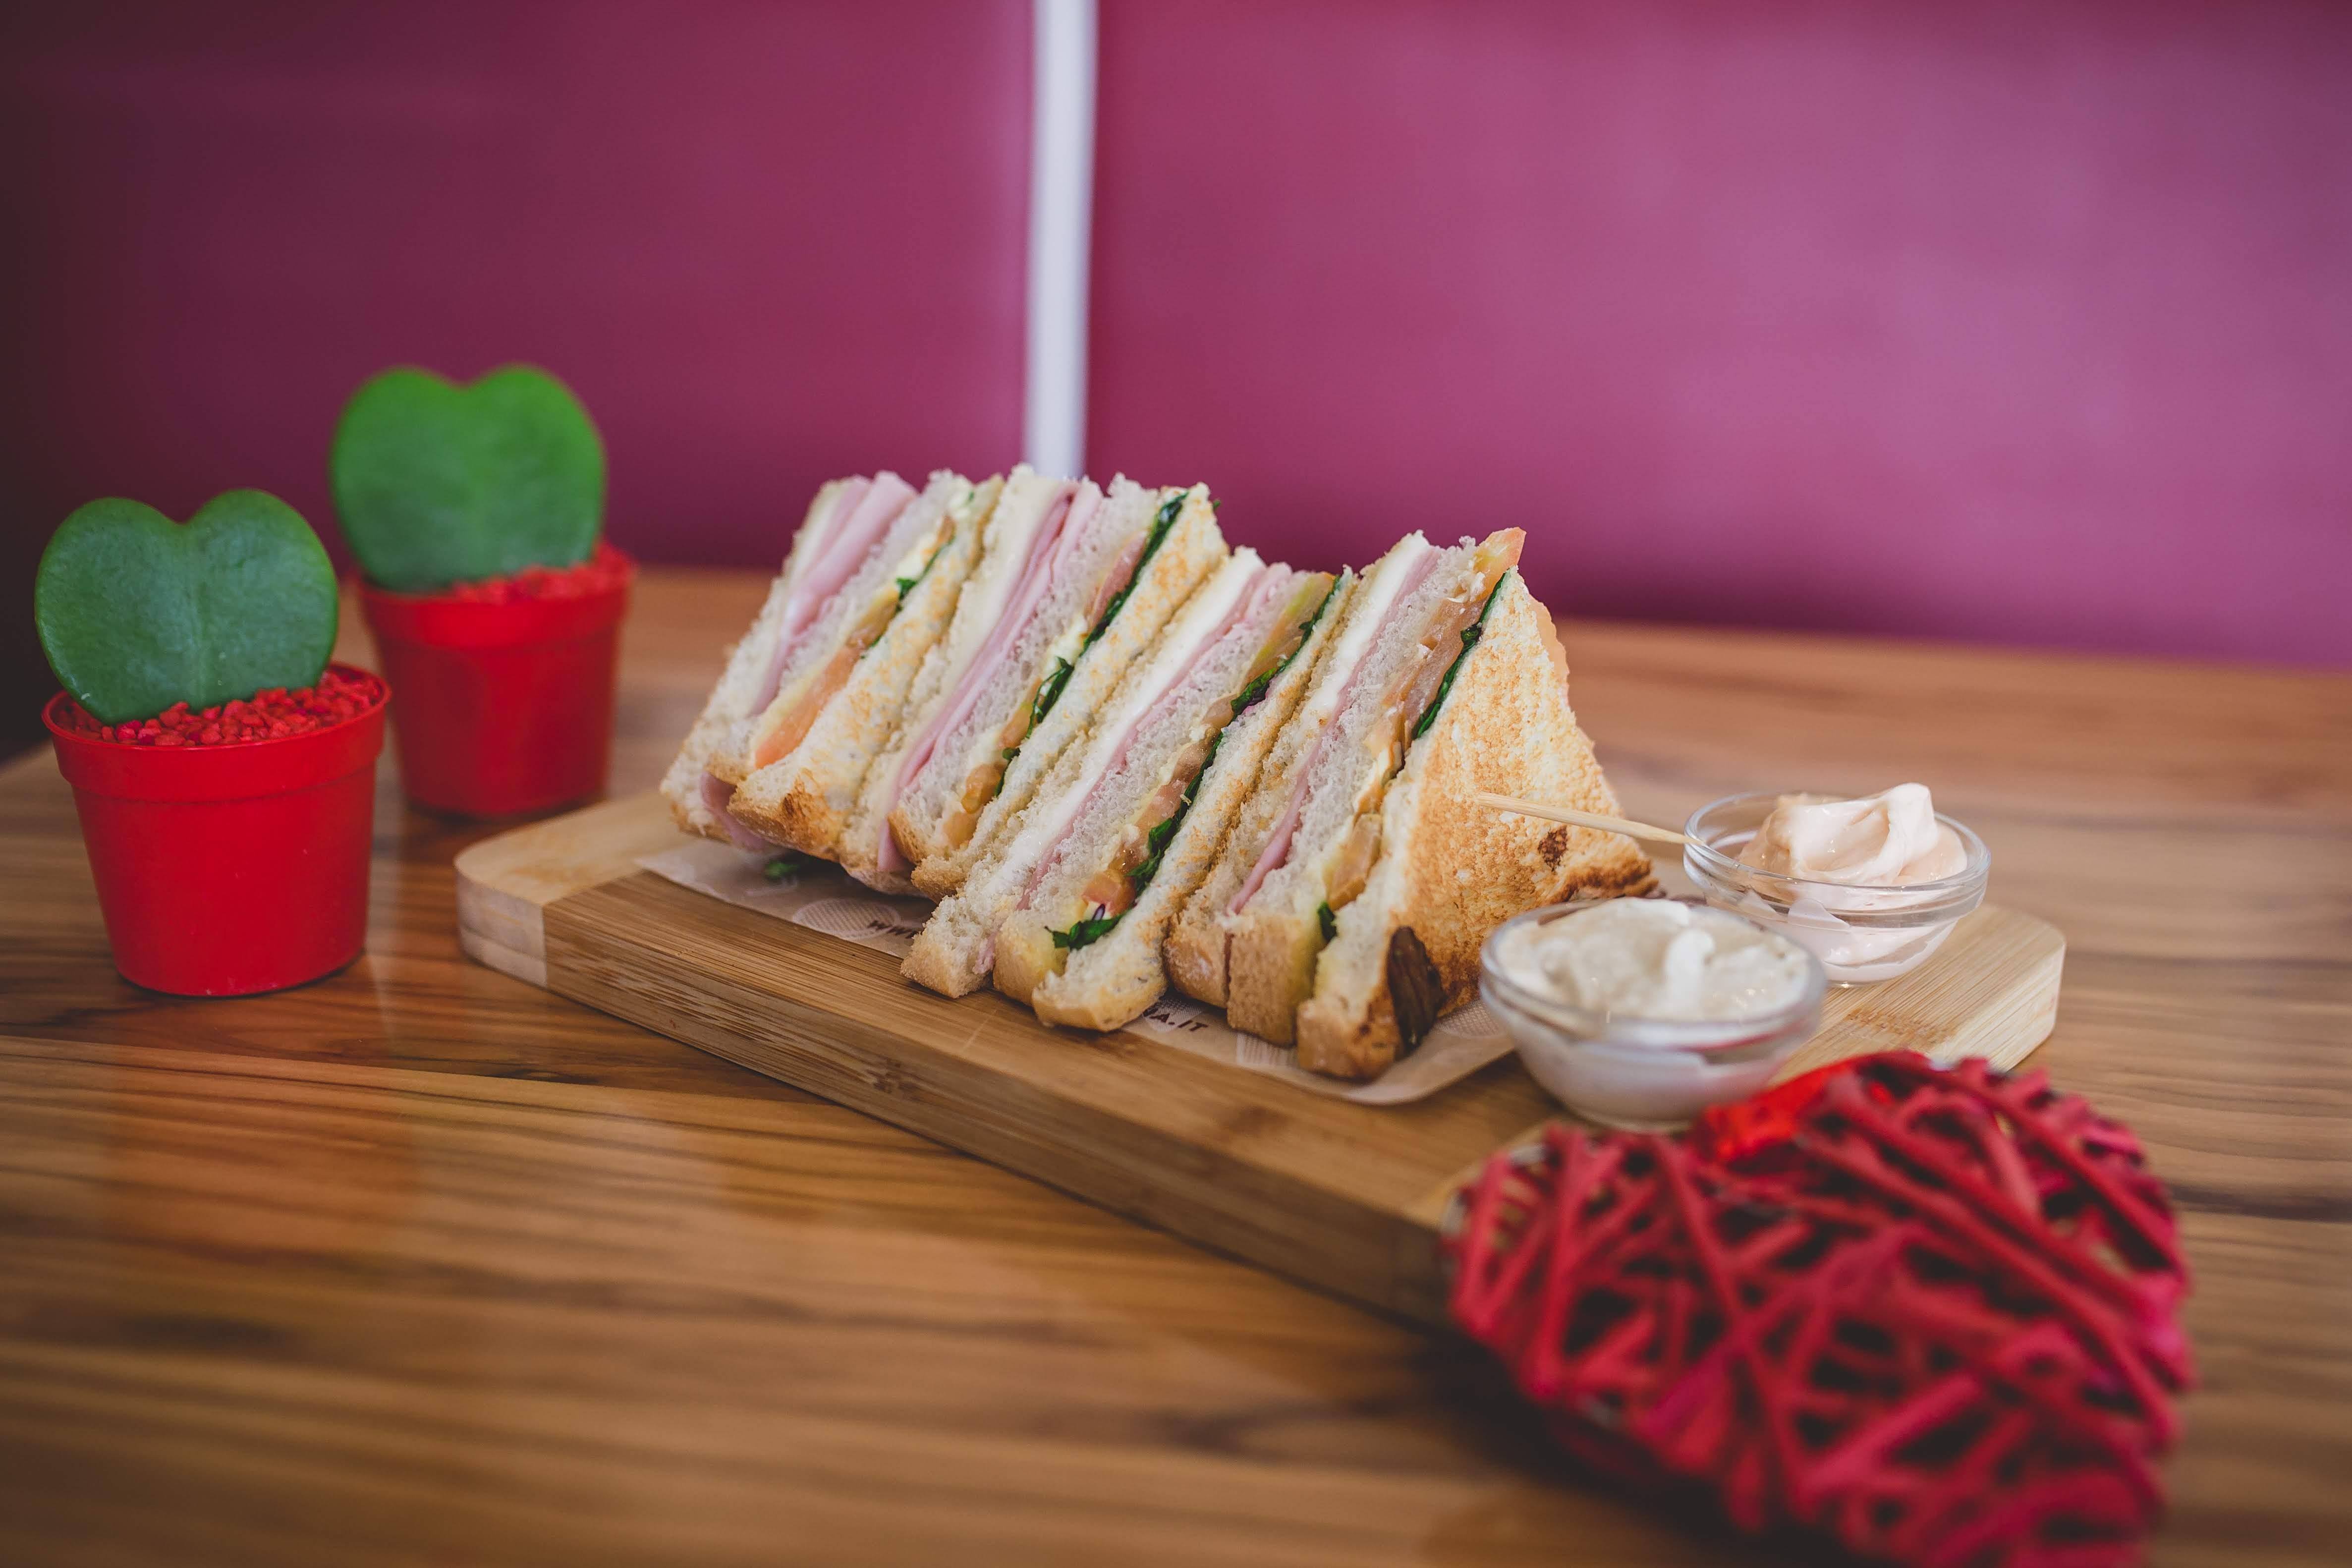 toasteria italiana club sandwich san valentino 3